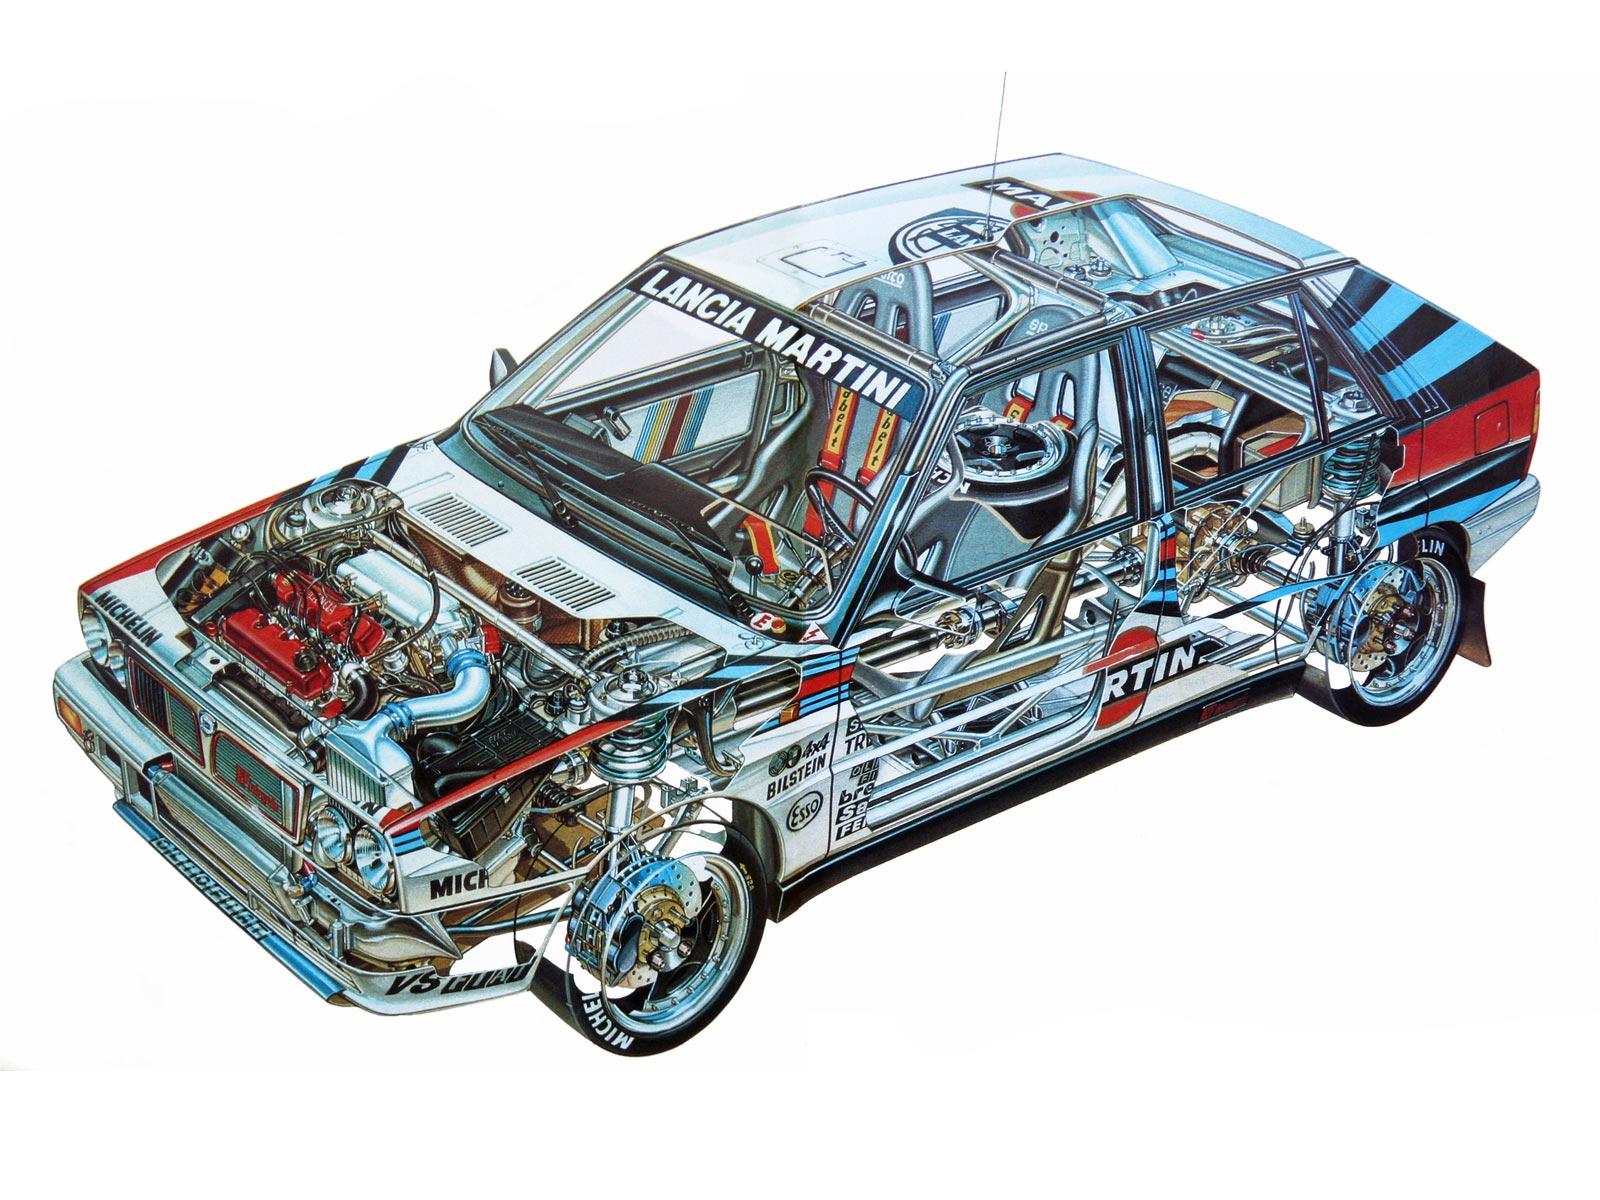 Lancia Delta HF Integrale cutaway